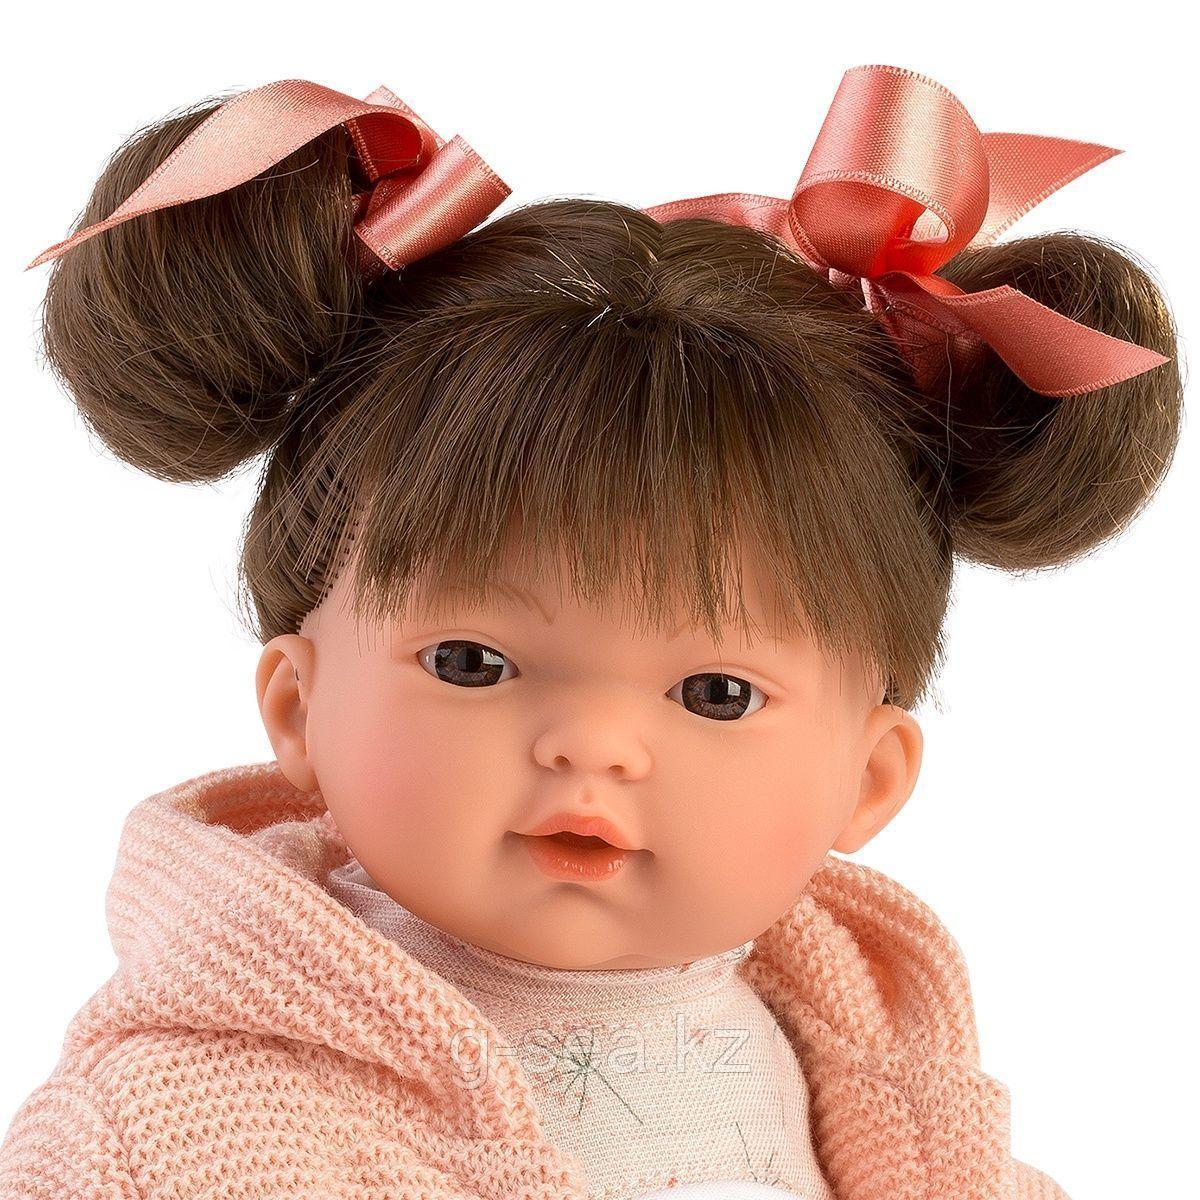 LLORENS: Кукла Рита 33 см., брюнетка в розовом жакете - фото 2